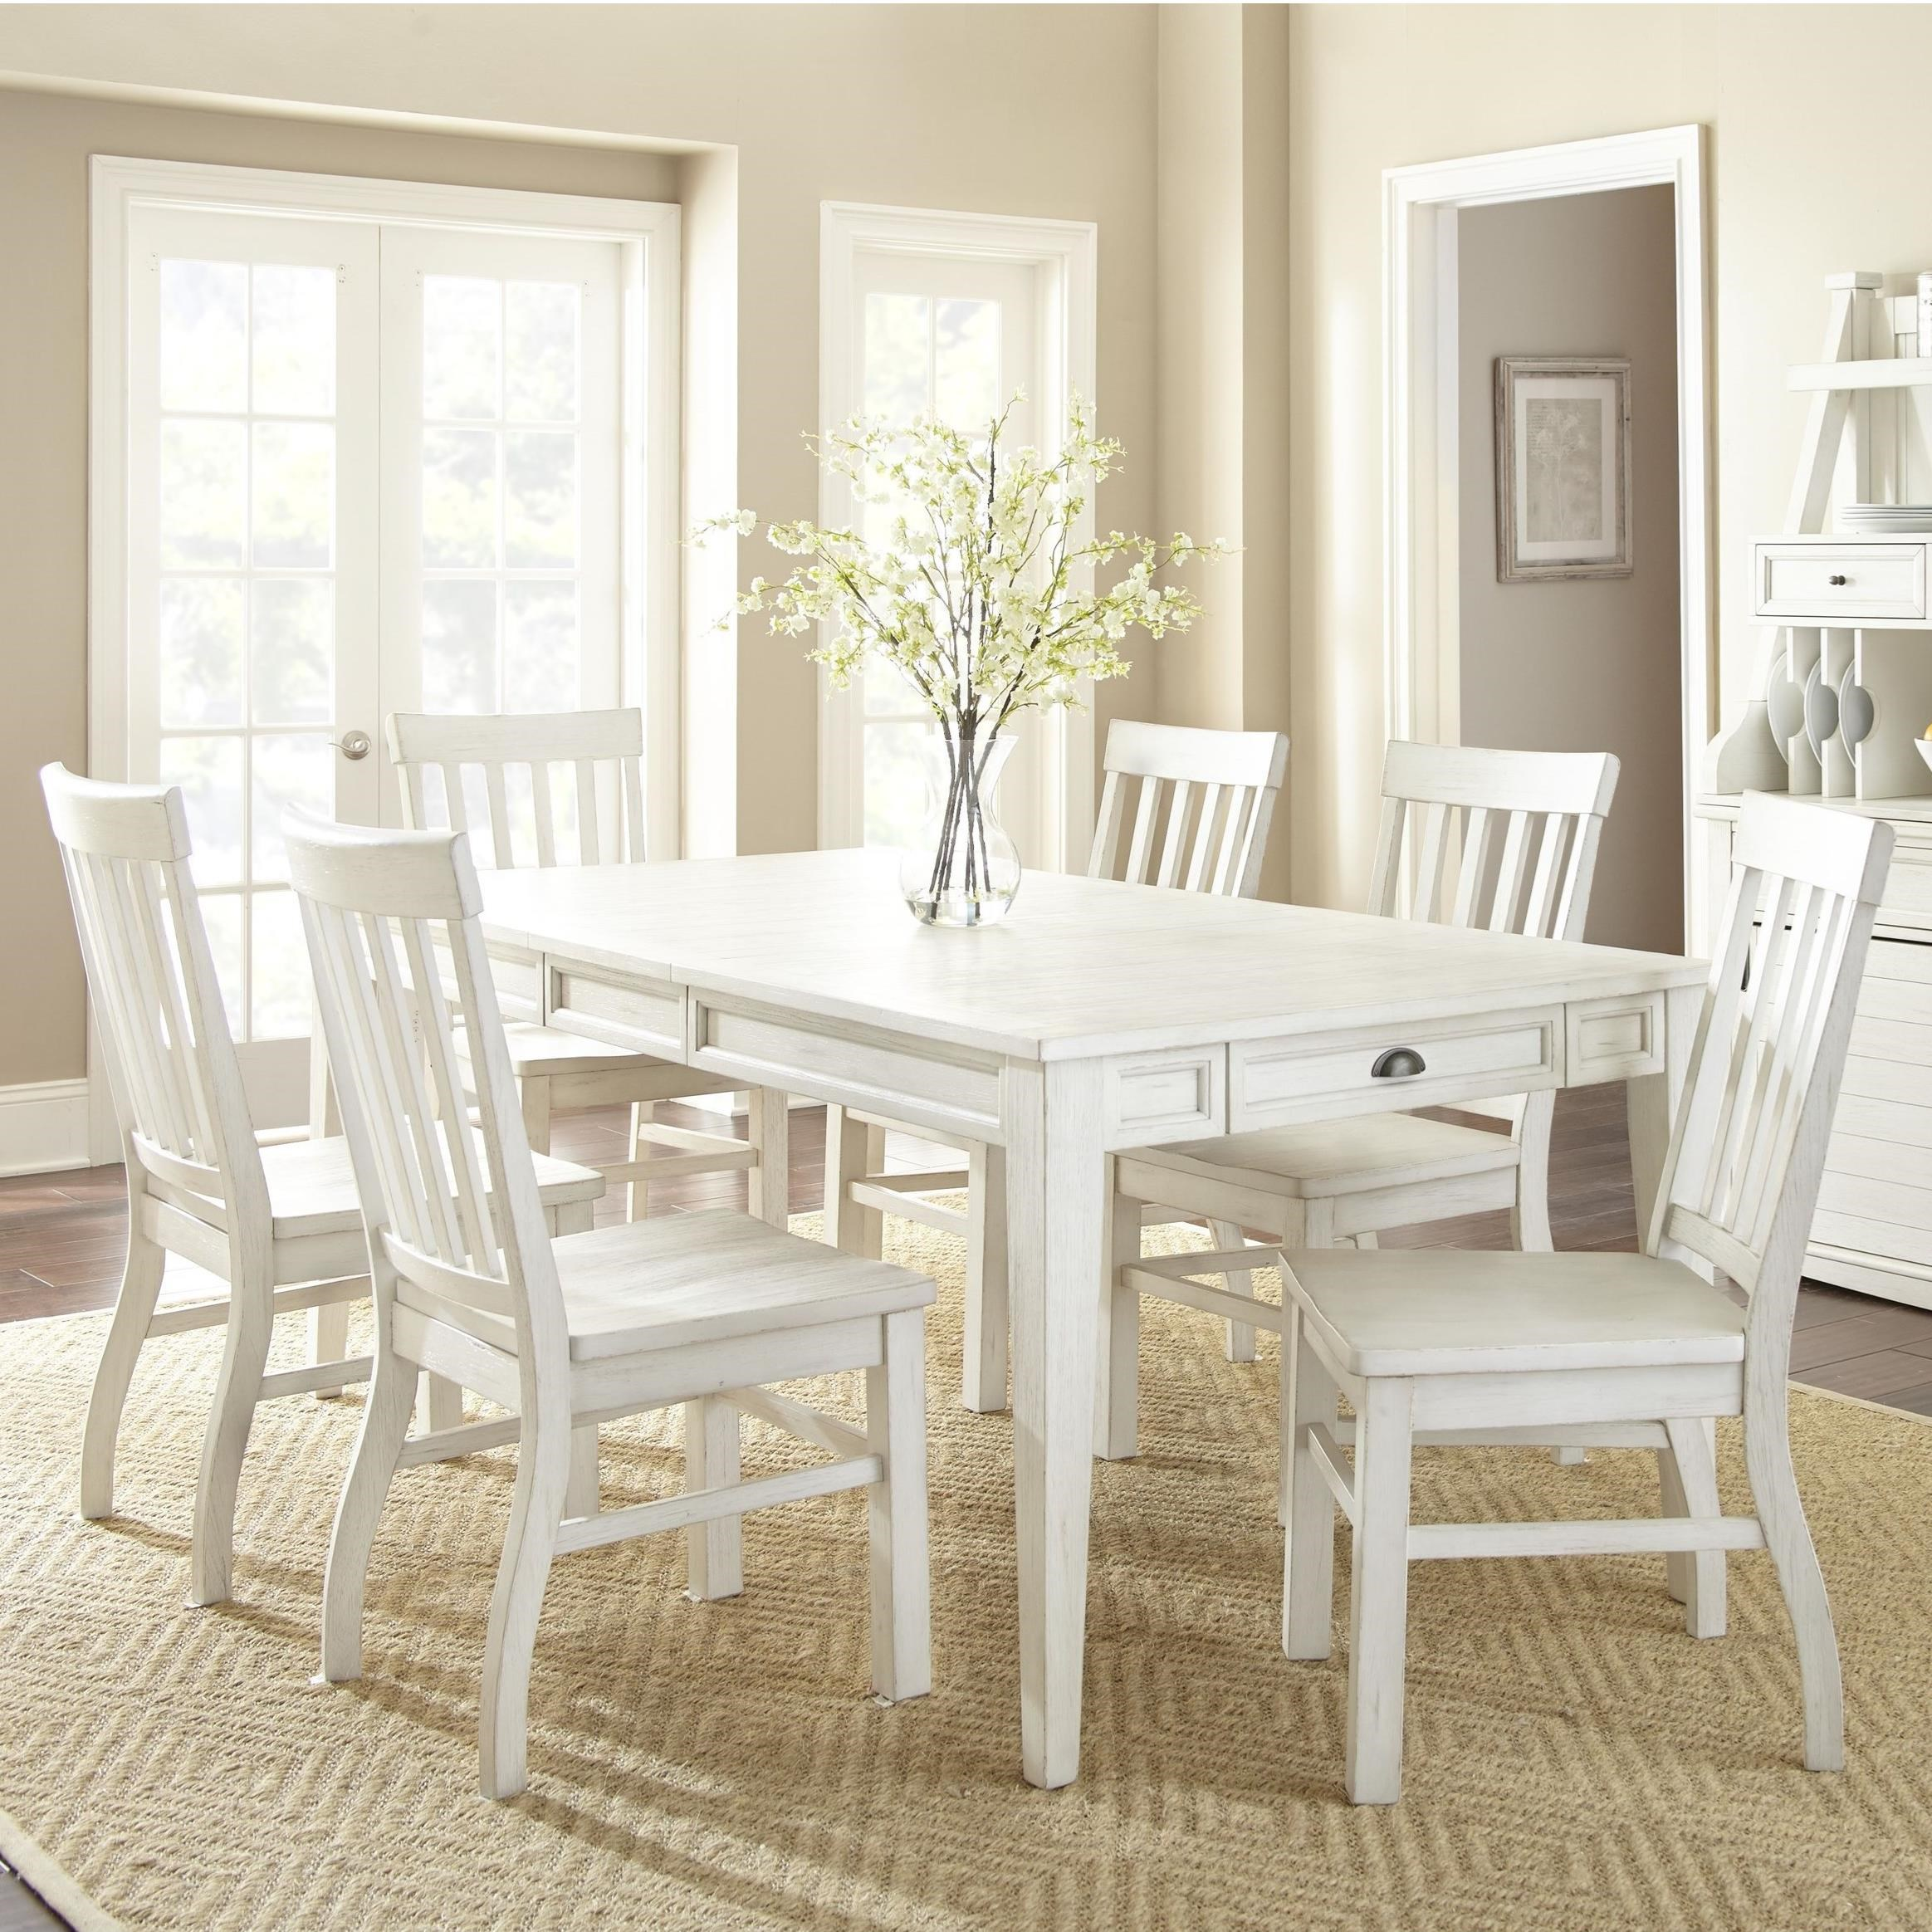 Prime cayla 7 piece farmhouse dining set with table for Farmhouse dining set